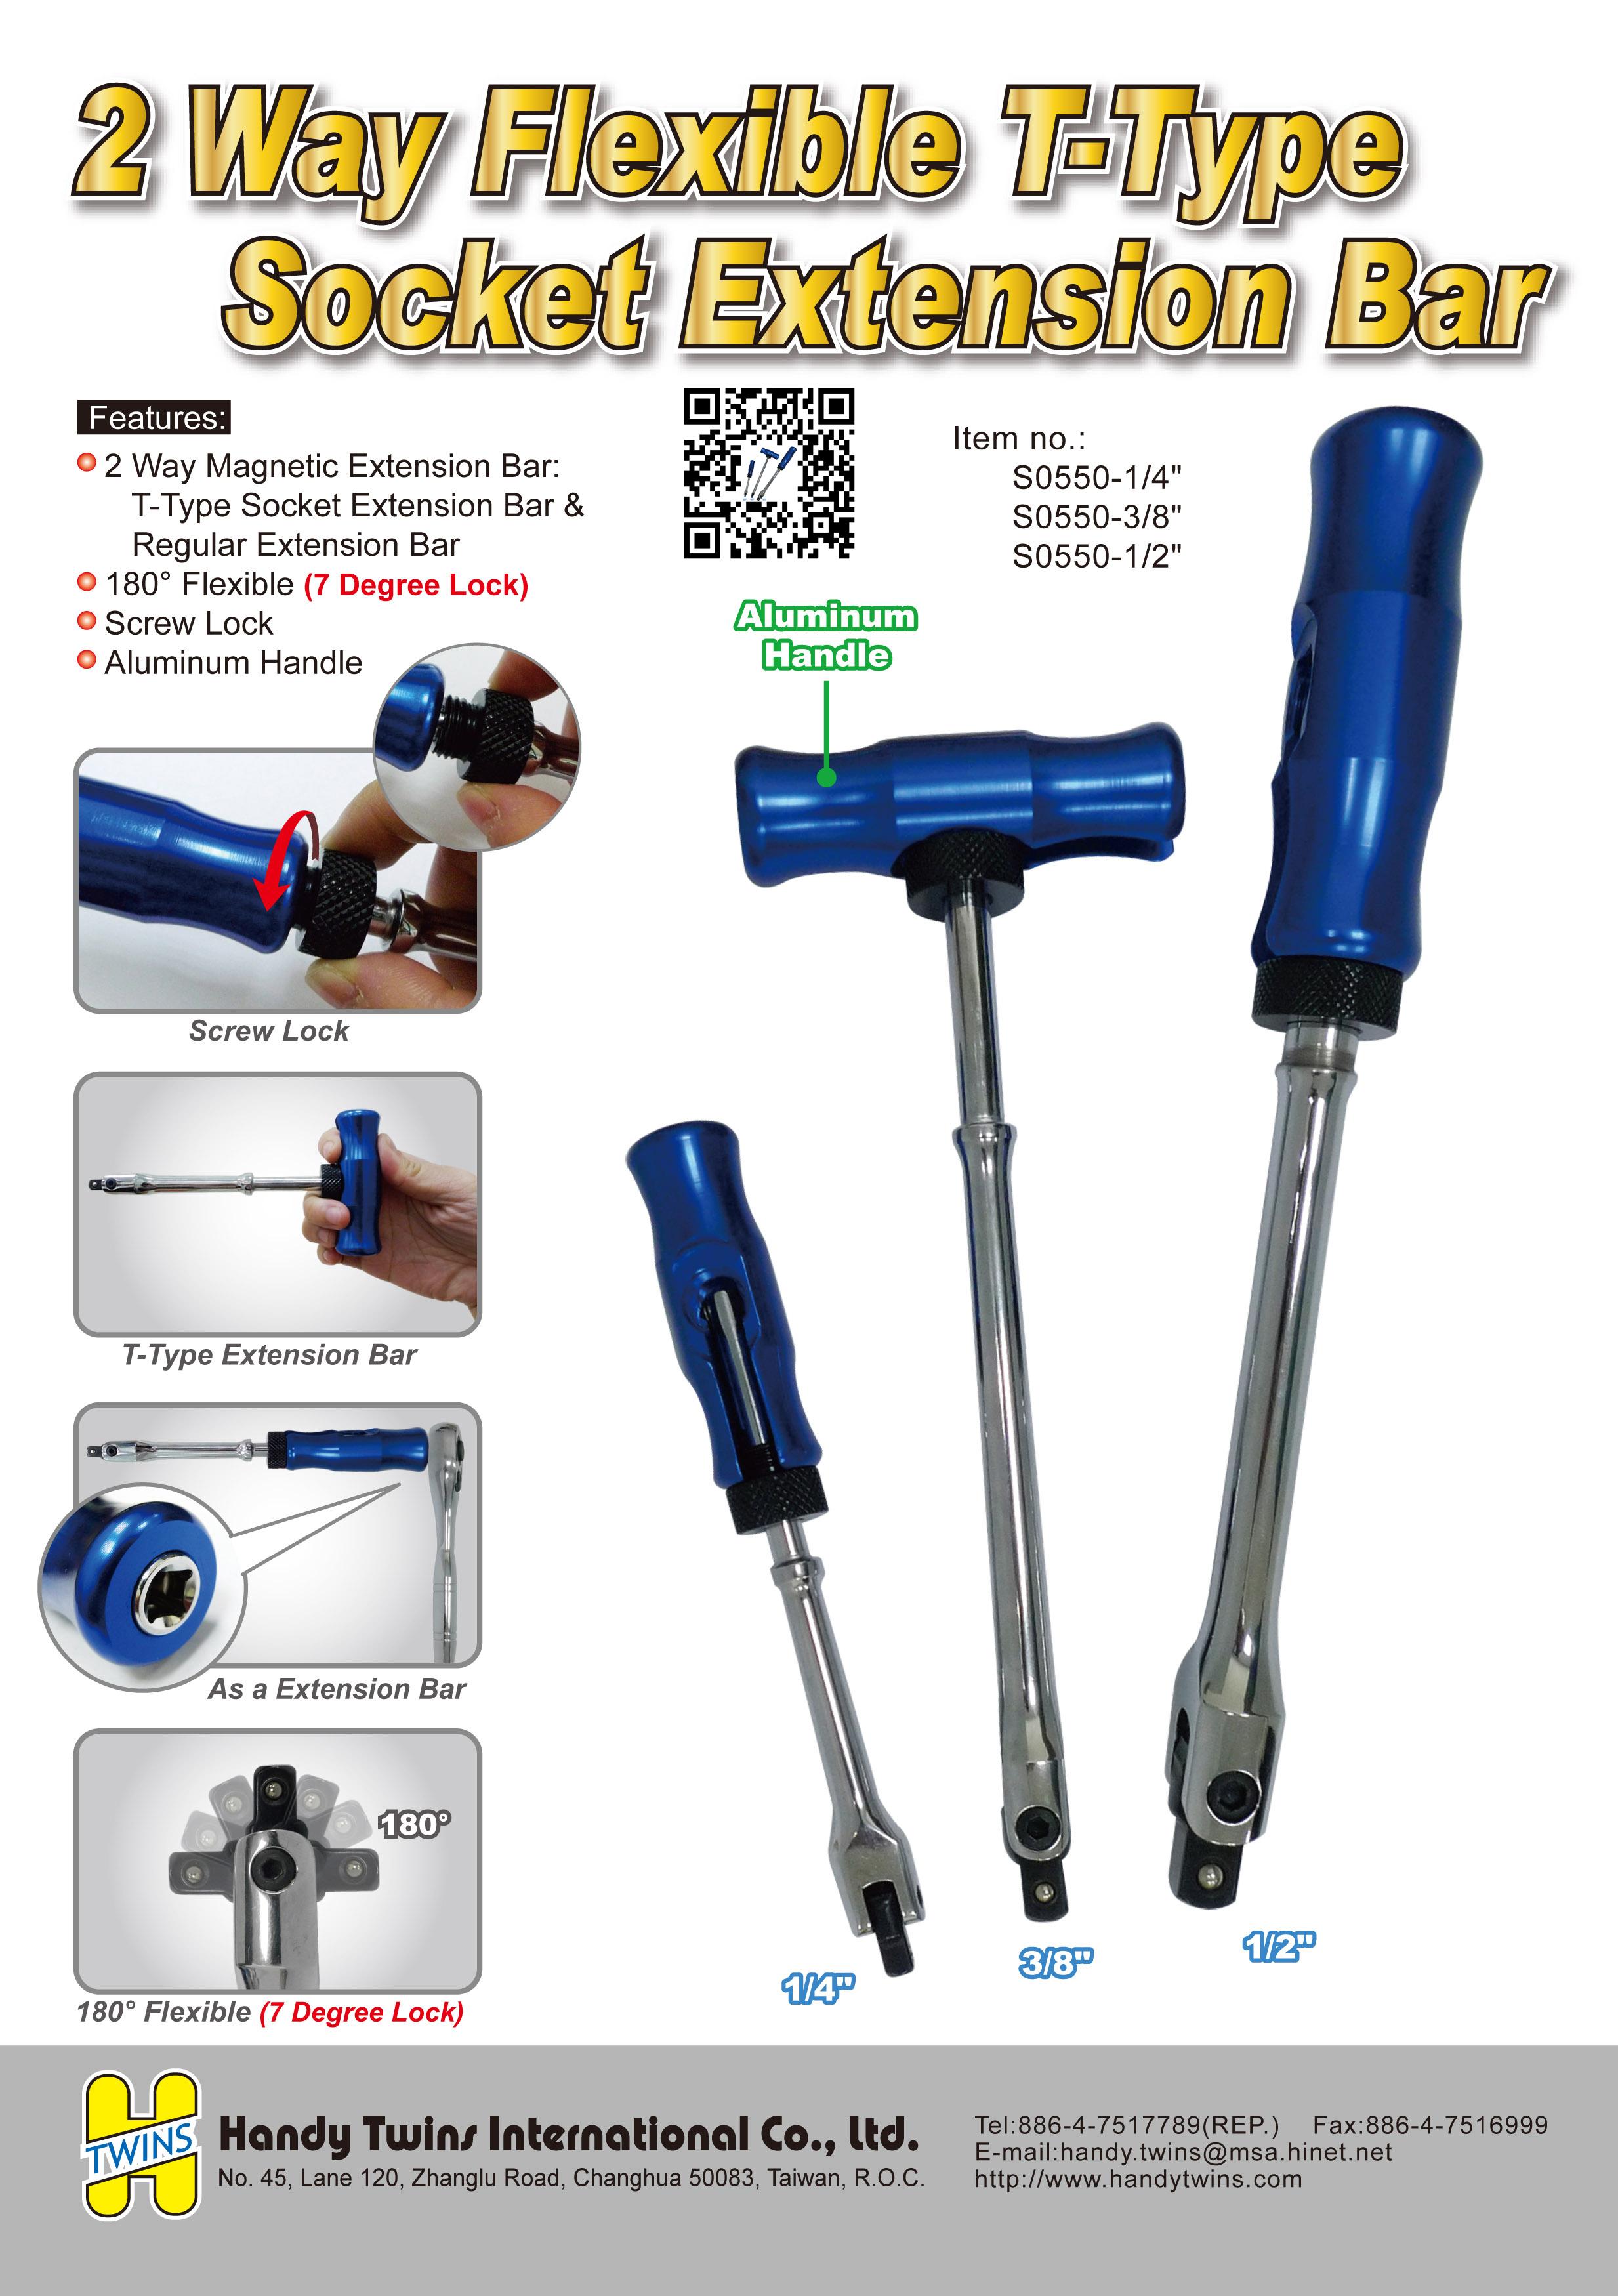 S0550-2 way flexible t-type socket extension bar